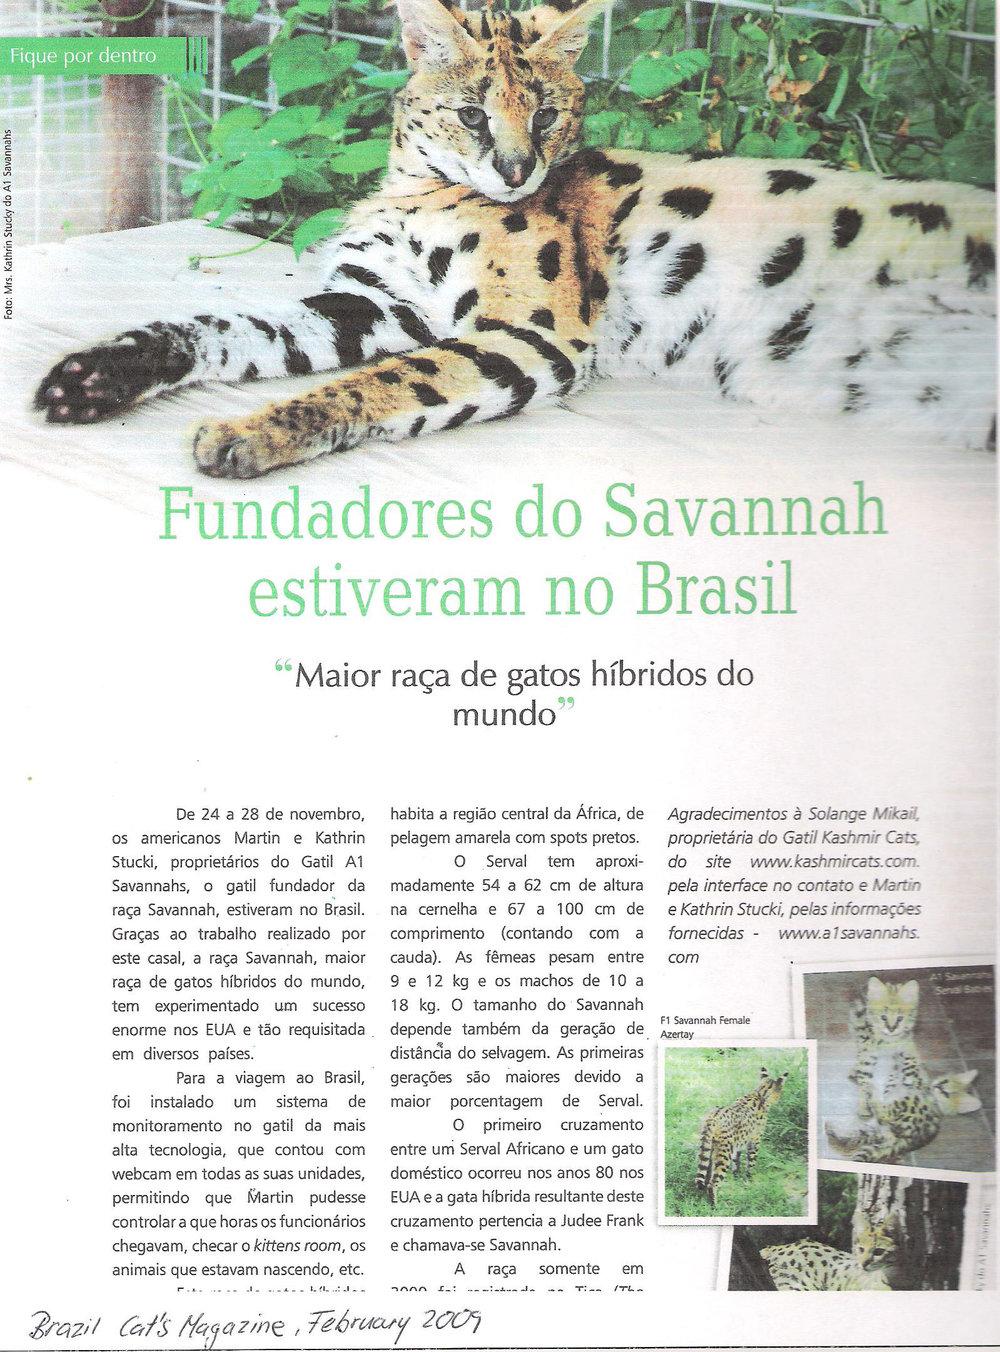 A1Savannahs Brazil Cat Magazine page 1